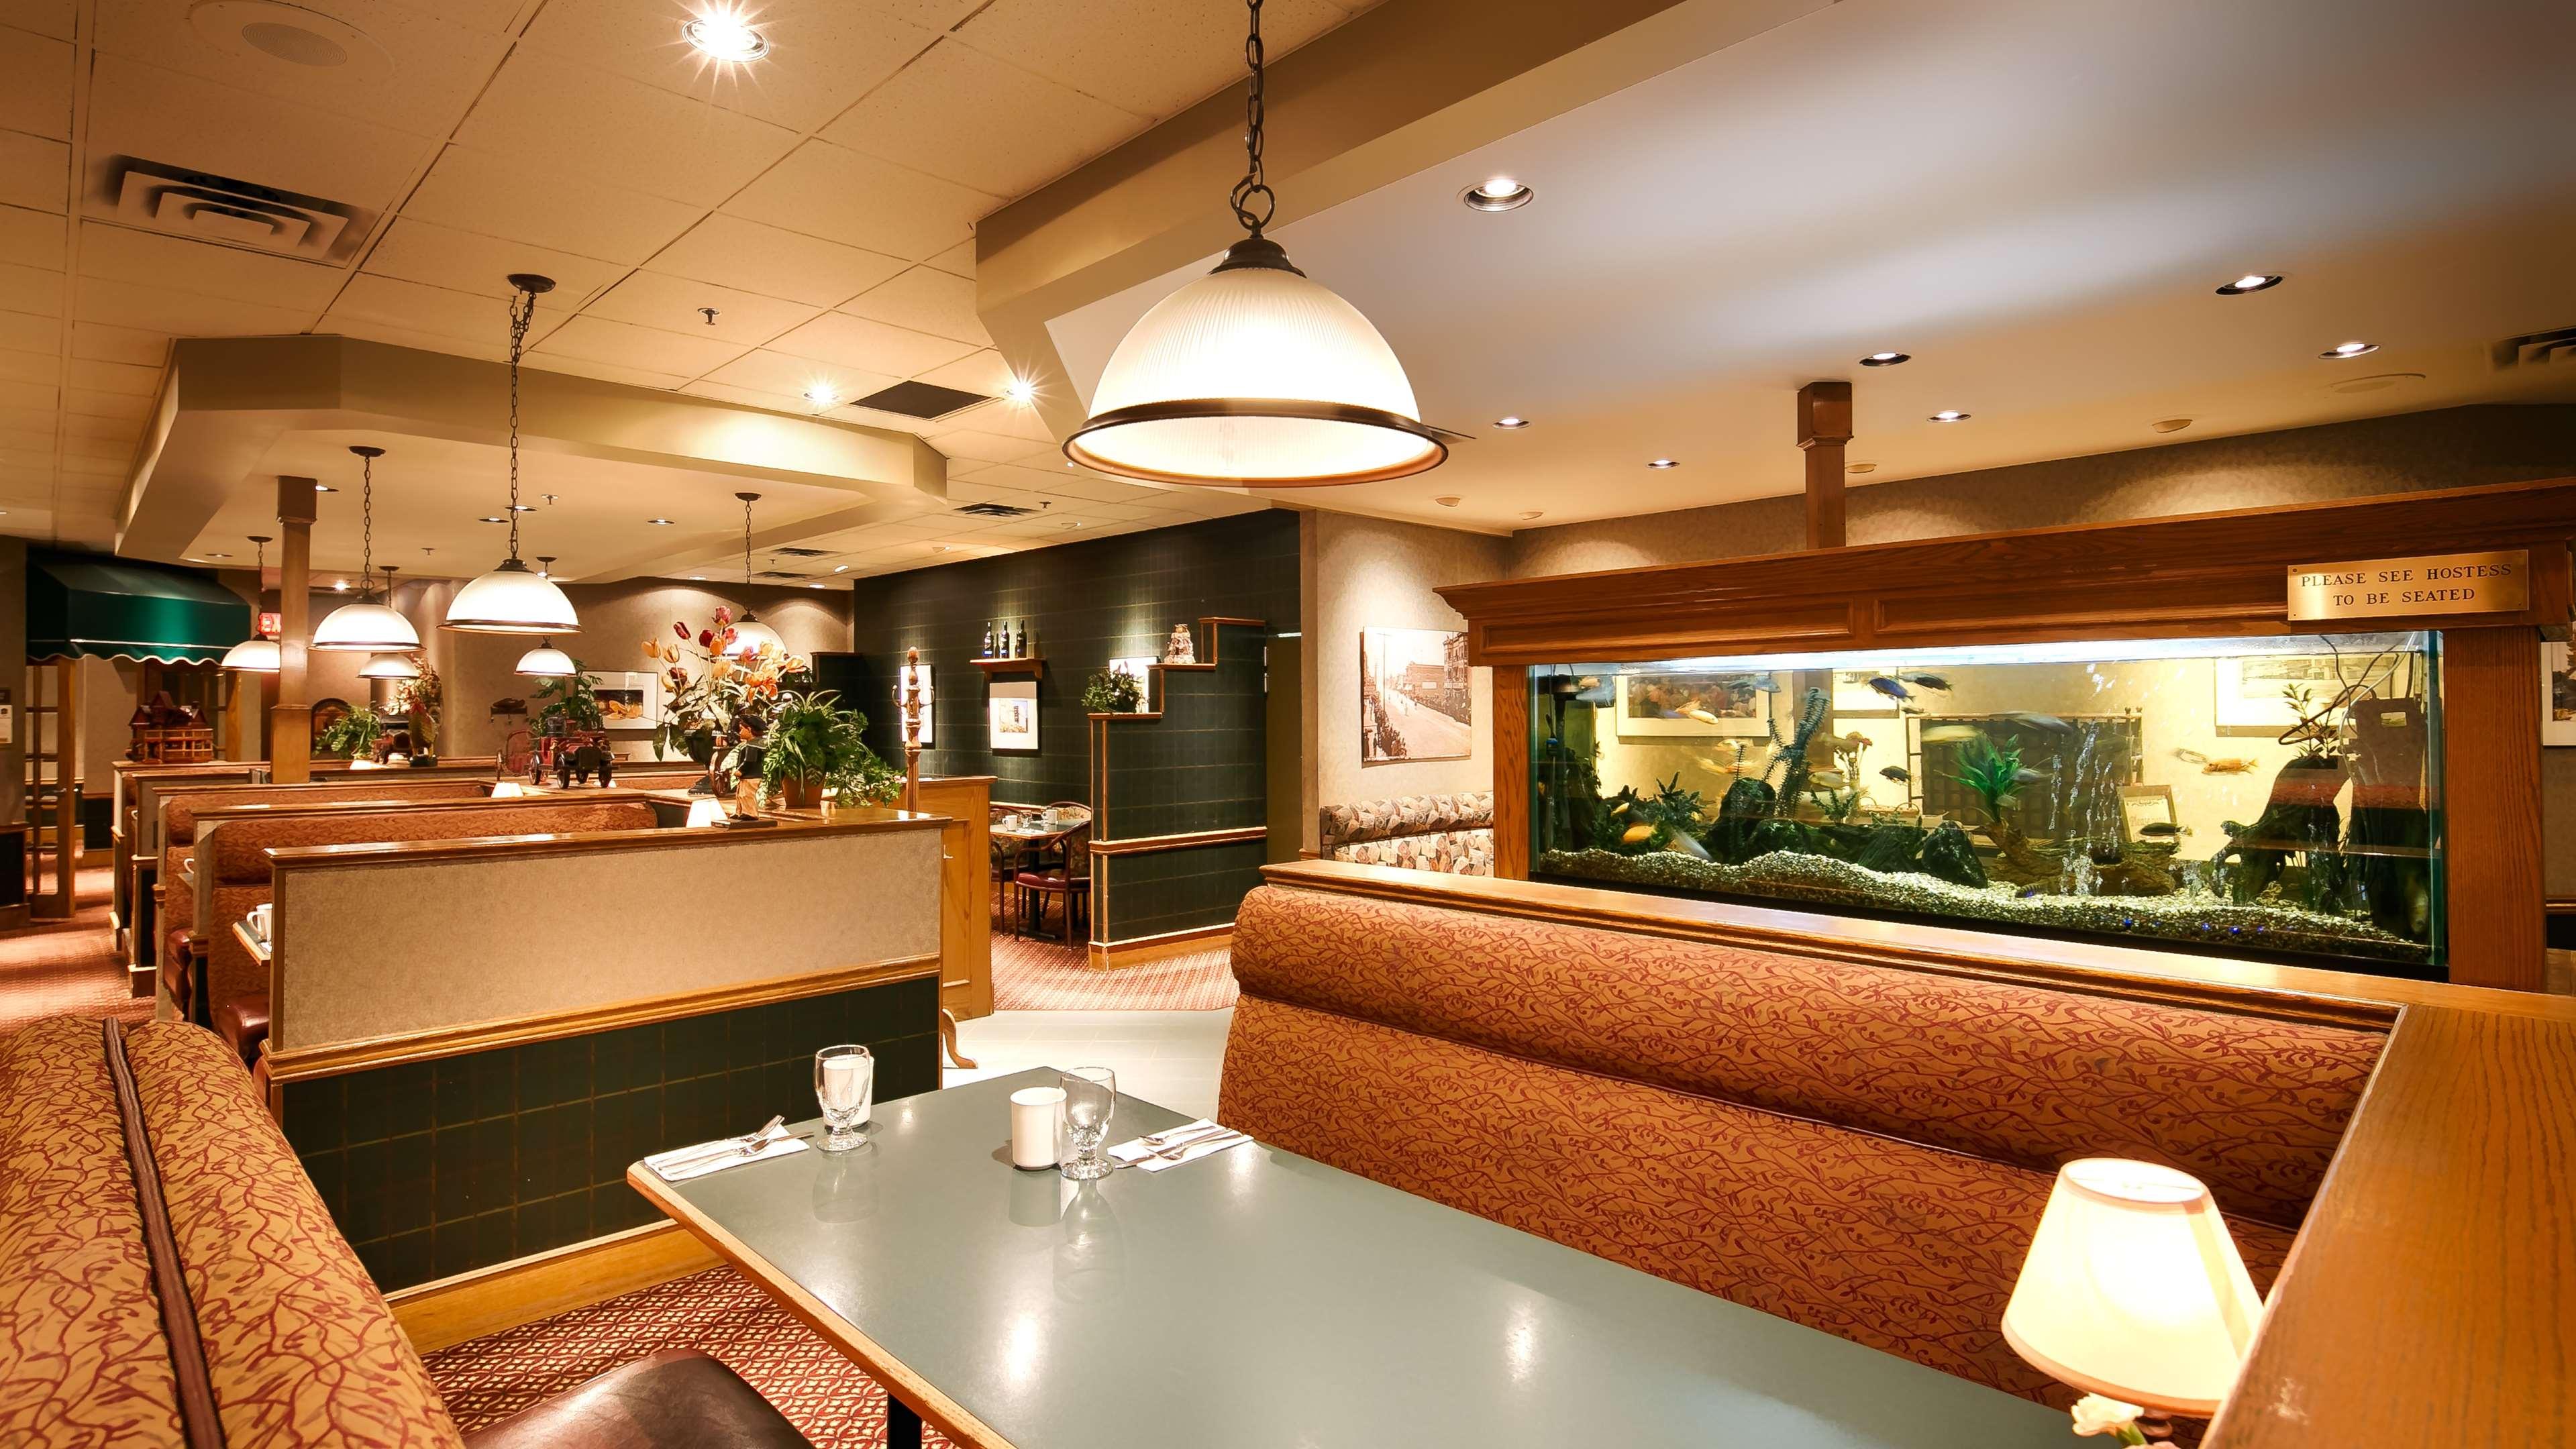 Best Western Plus Baker Street Inn & Convention Centre in Nelson: Baker Street Grill